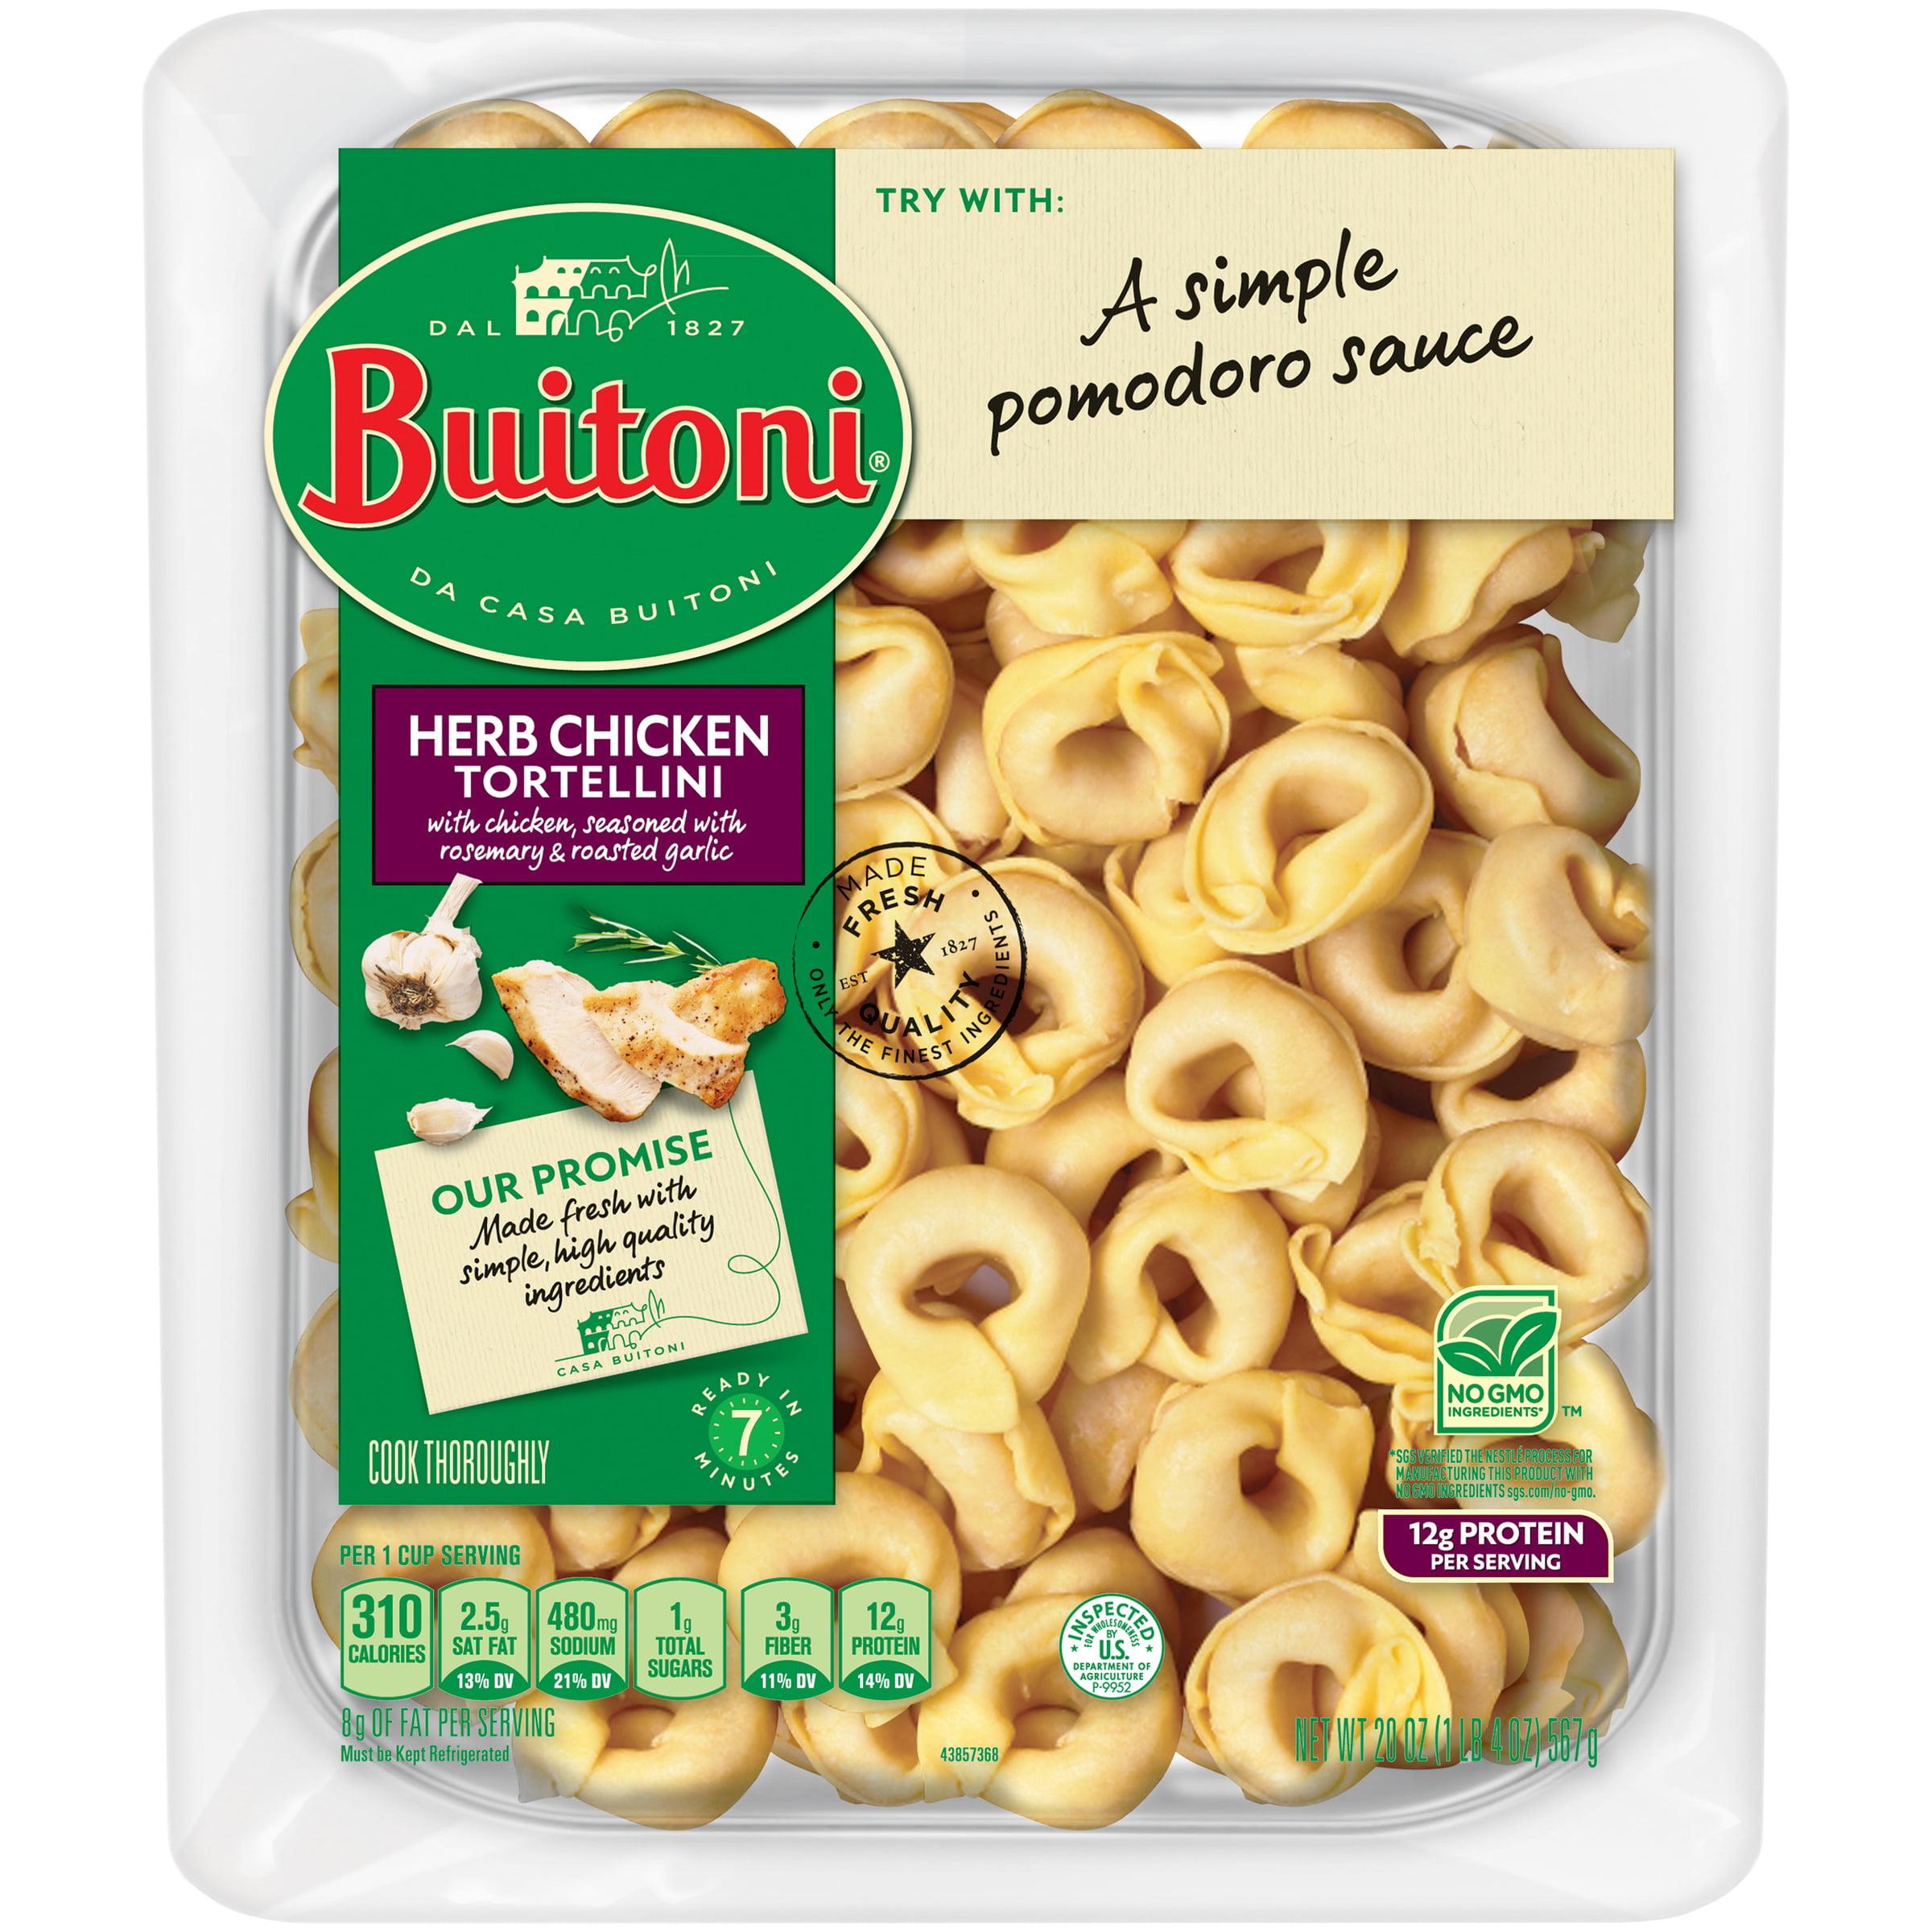 Buitoni Herb Chicken Tortellini Refrigerated Pasta 20 Oz Pack